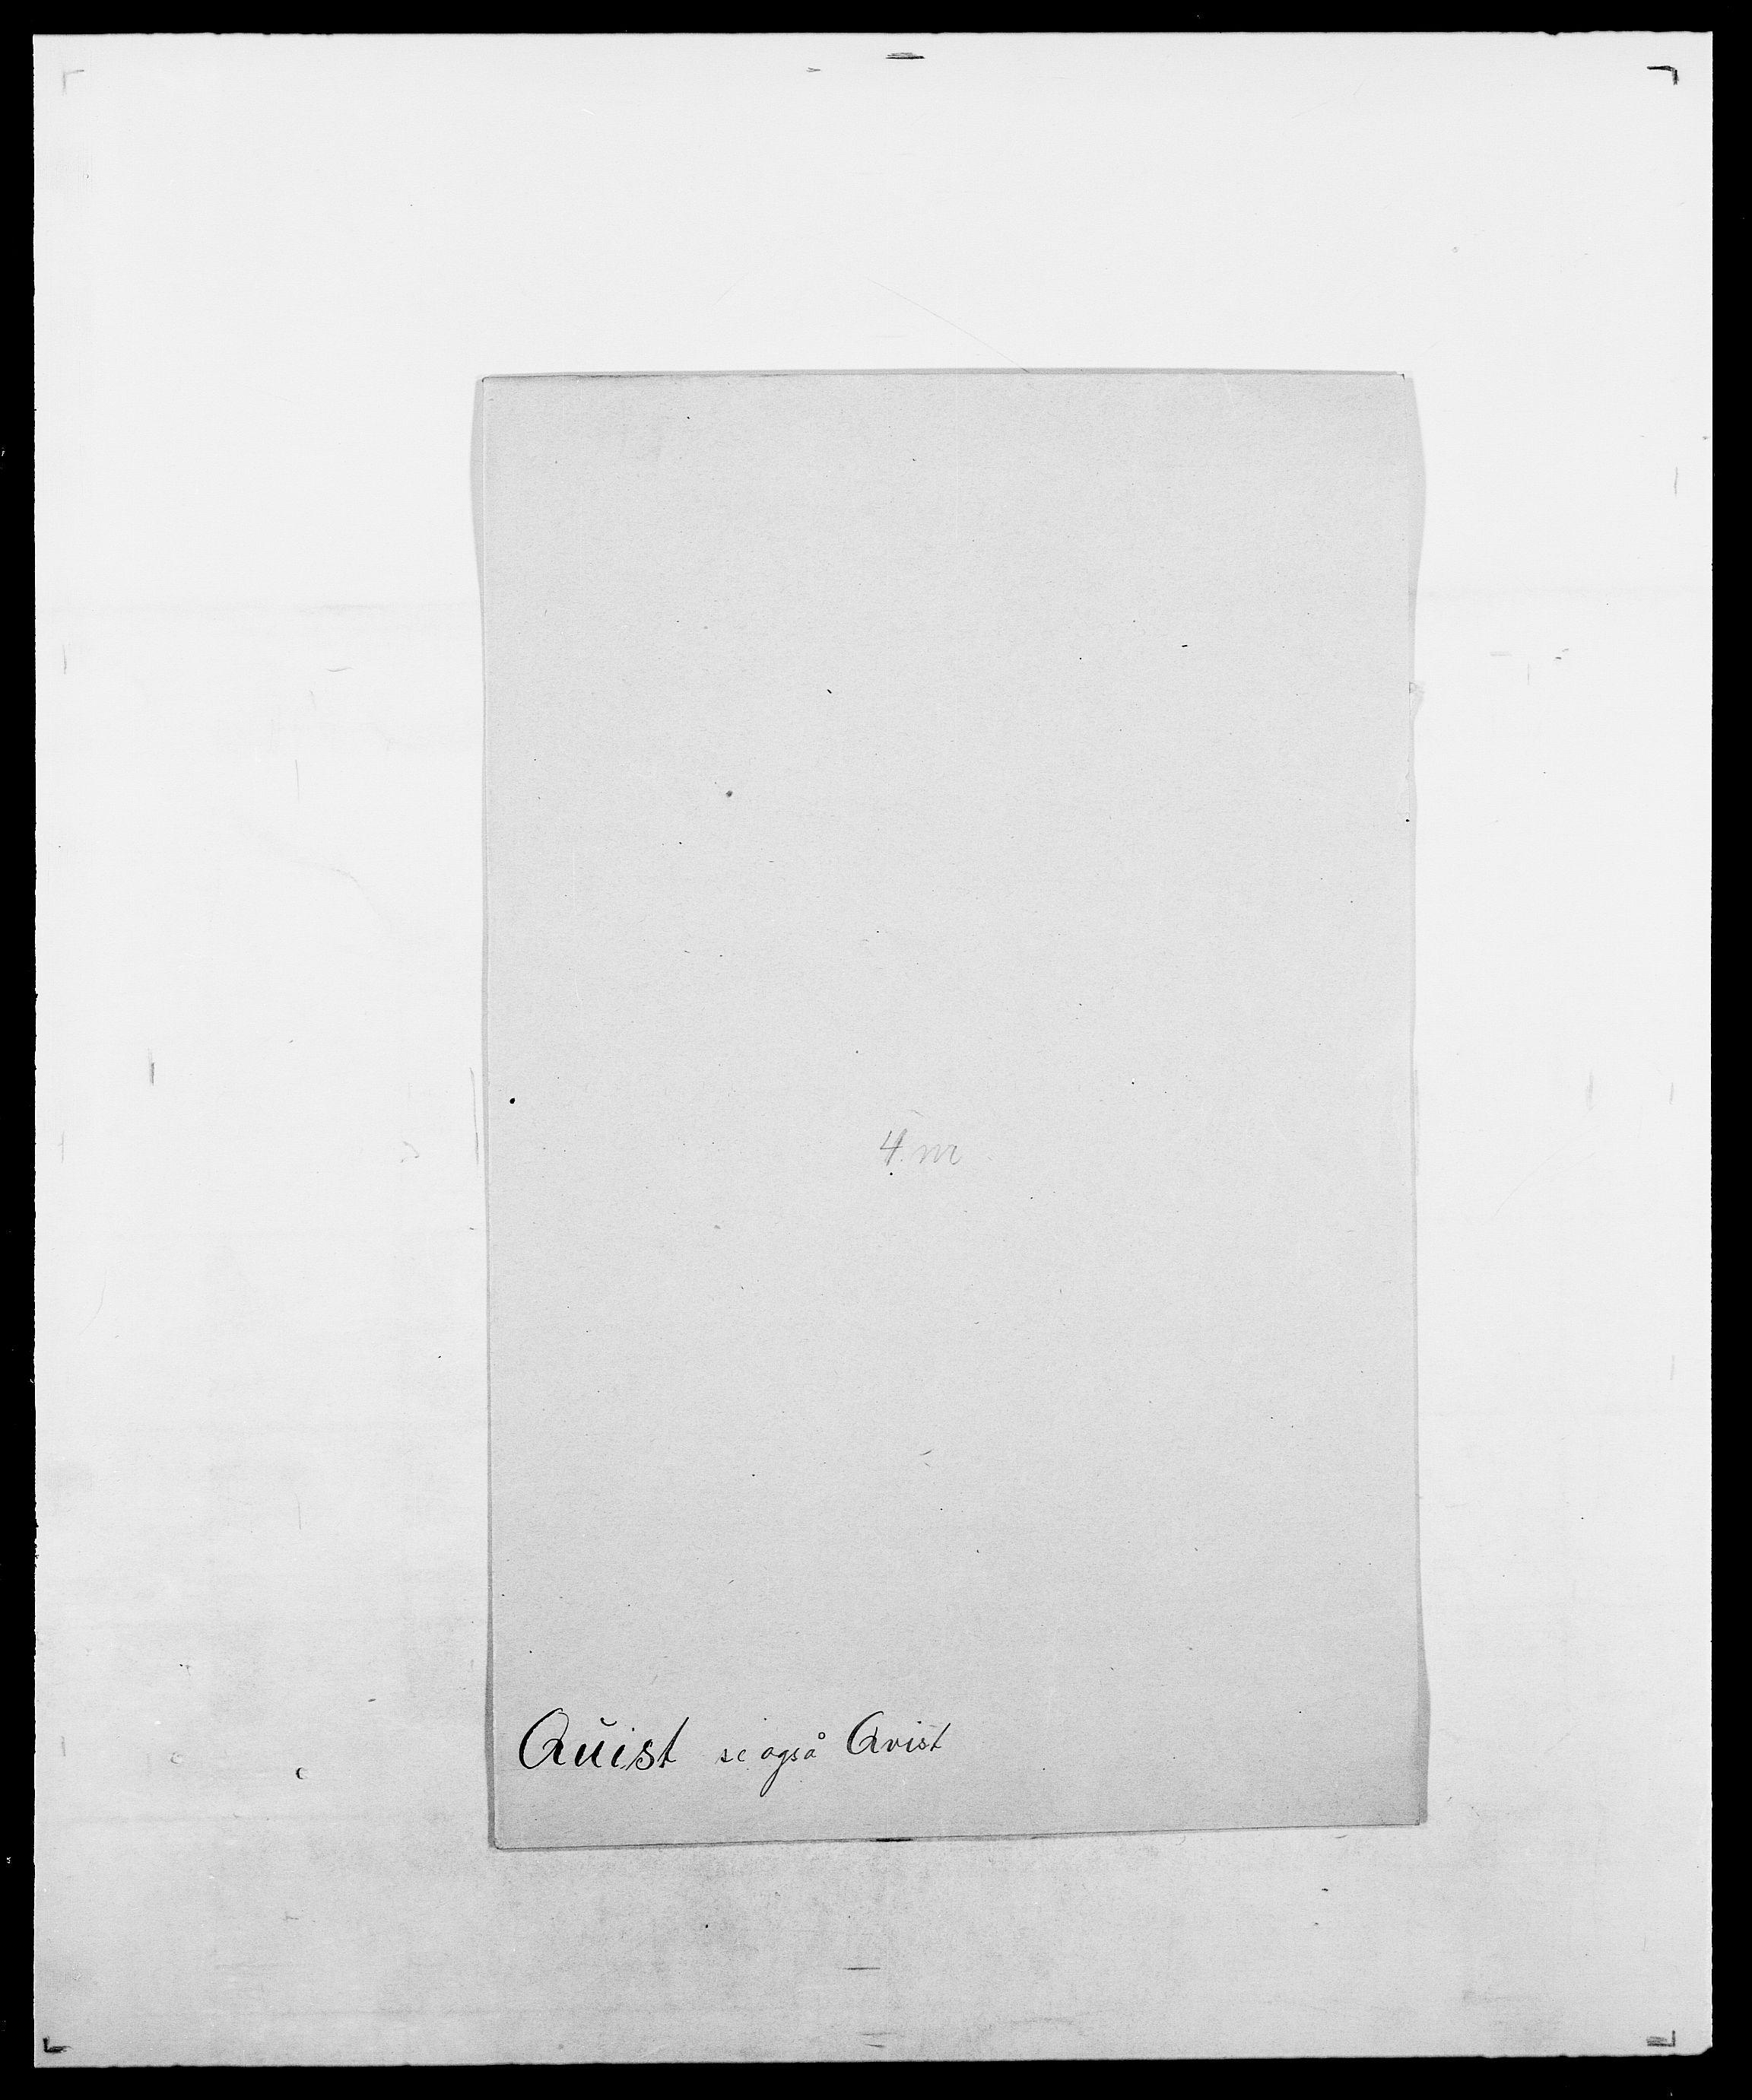 SAO, Delgobe, Charles Antoine - samling, D/Da/L0031: de Place - Raaum, s. 484